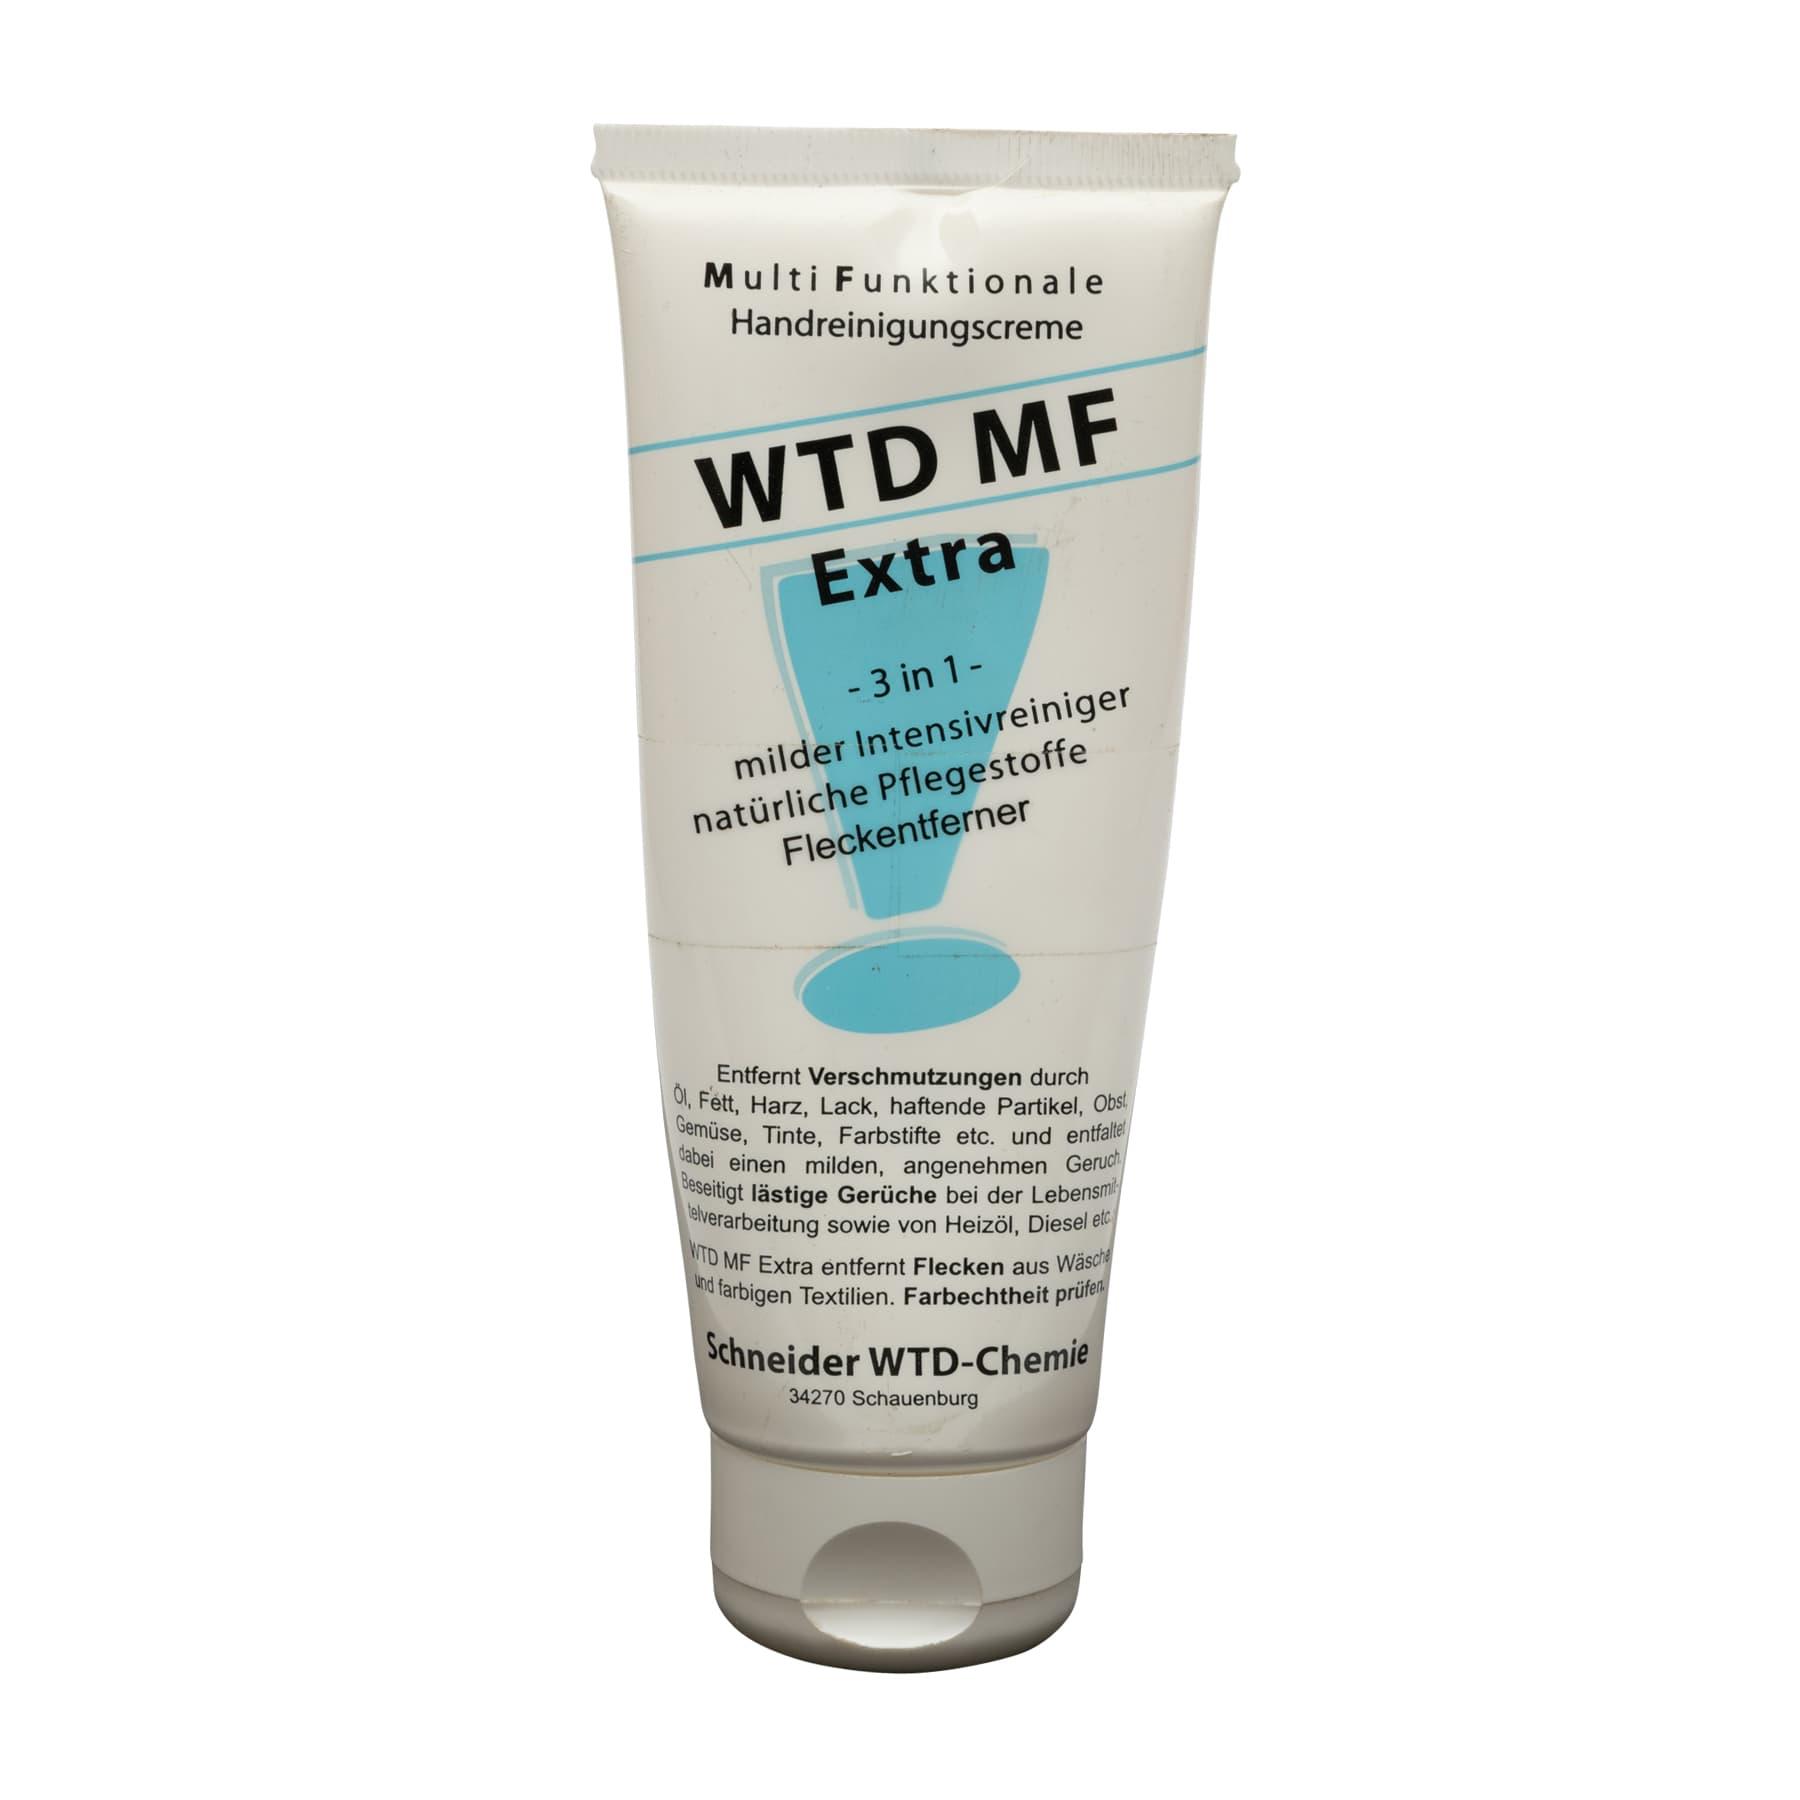 WTD MF Handreinigungscreme 100 ml